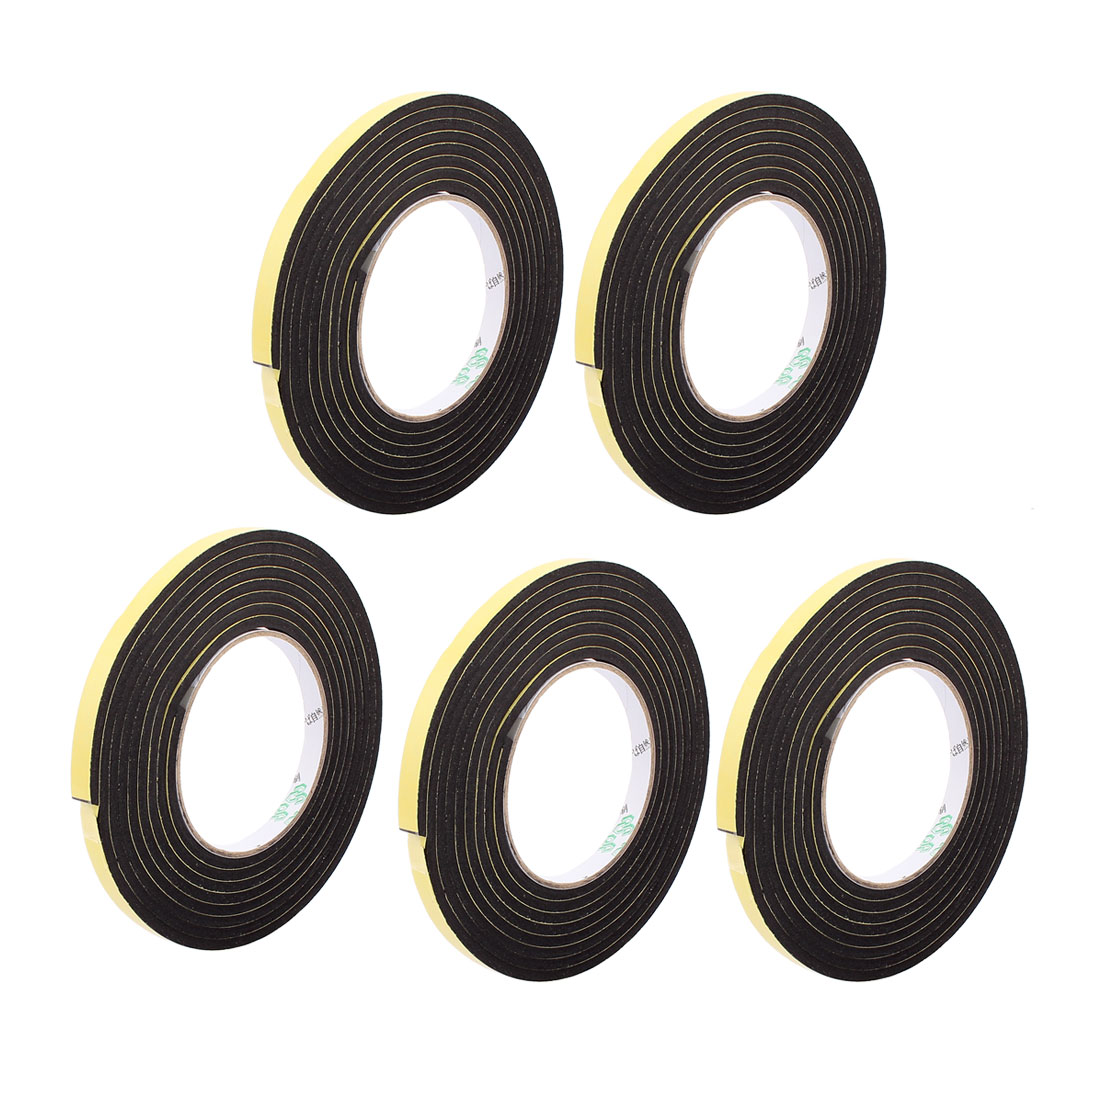 5Pcs 1.2CM Width 3 Meters Length 4MM Thick Single Sided Sealing Shockproof Sponge Tape